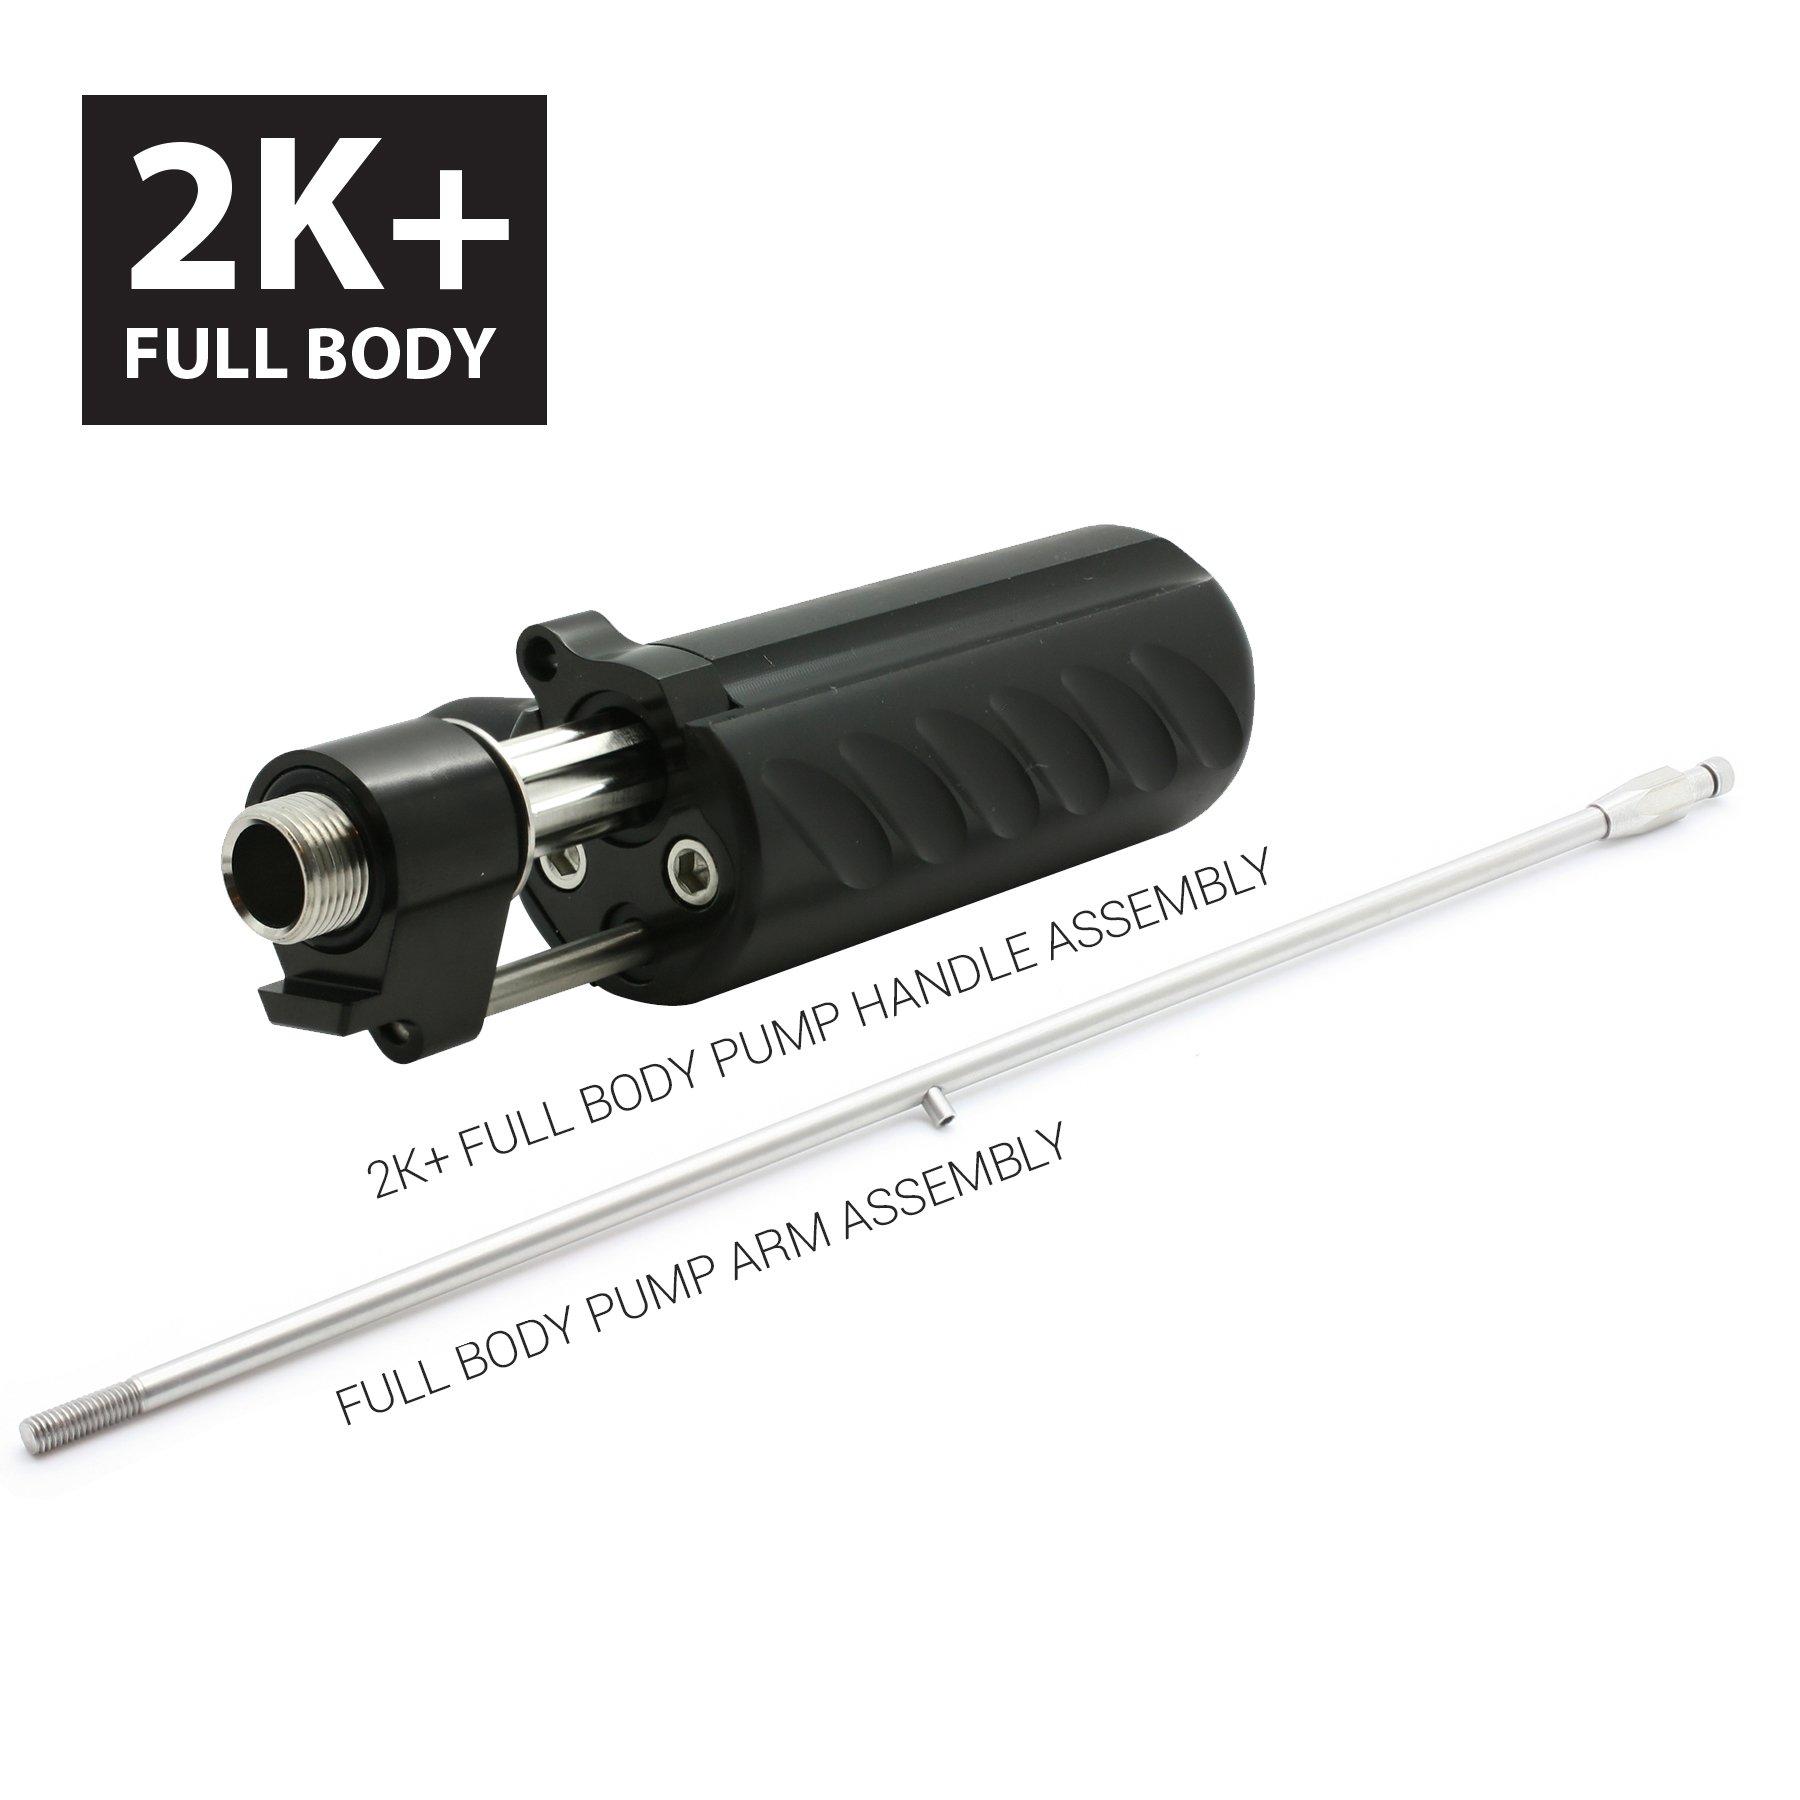 Inception Designs Drift Pump Kit - Autococker 2K+ by Inception Designs